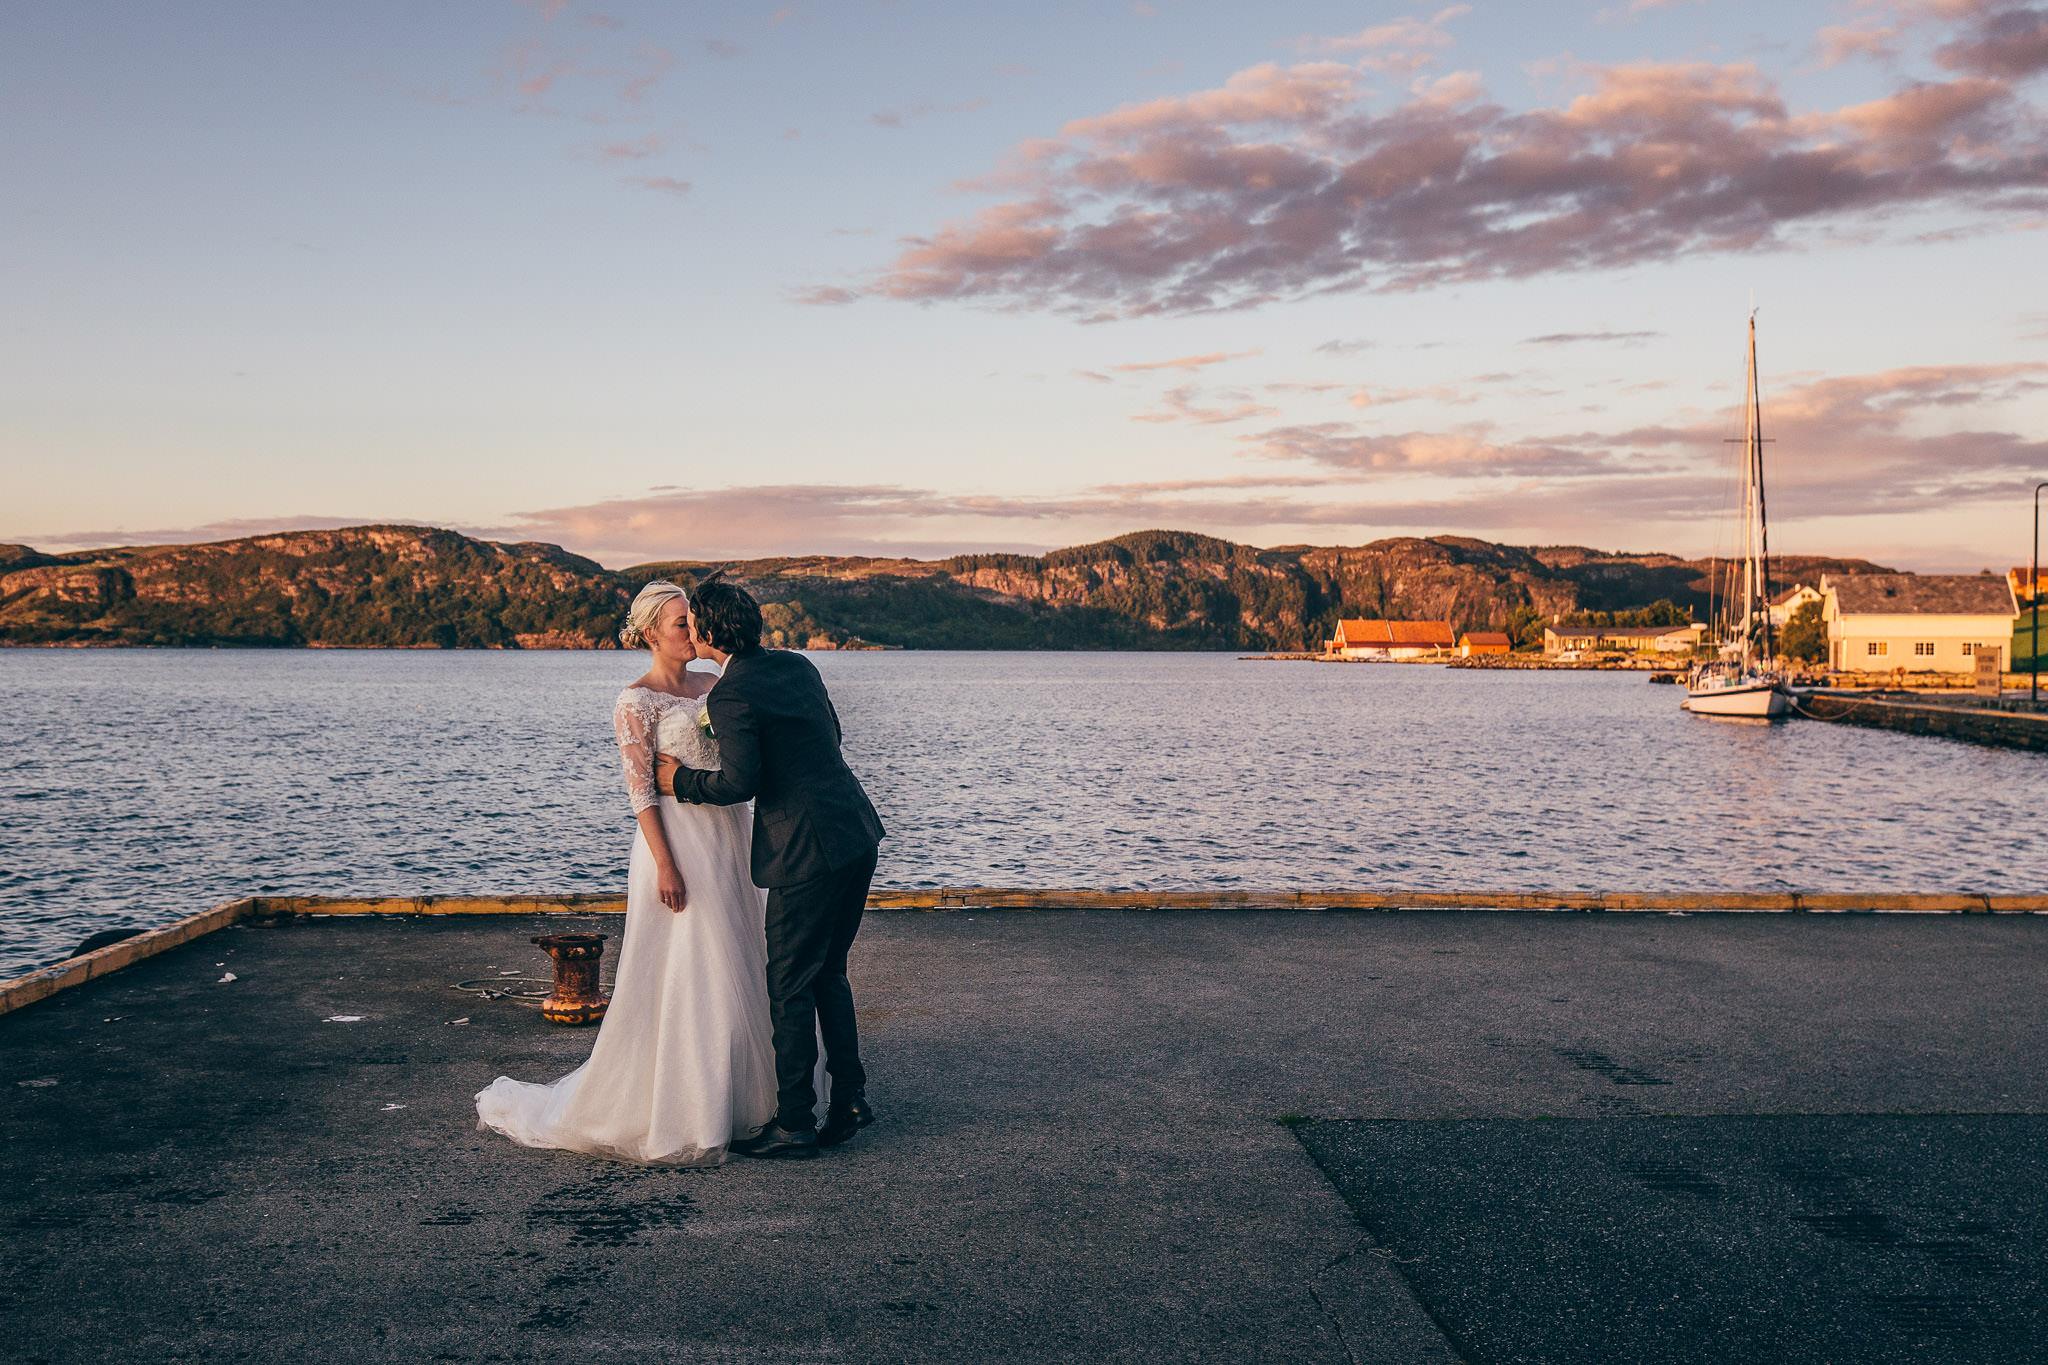 Wedding+Photographer+Norway+Bryllupsfotograf+Casey+Arneson+JT-177.jpg